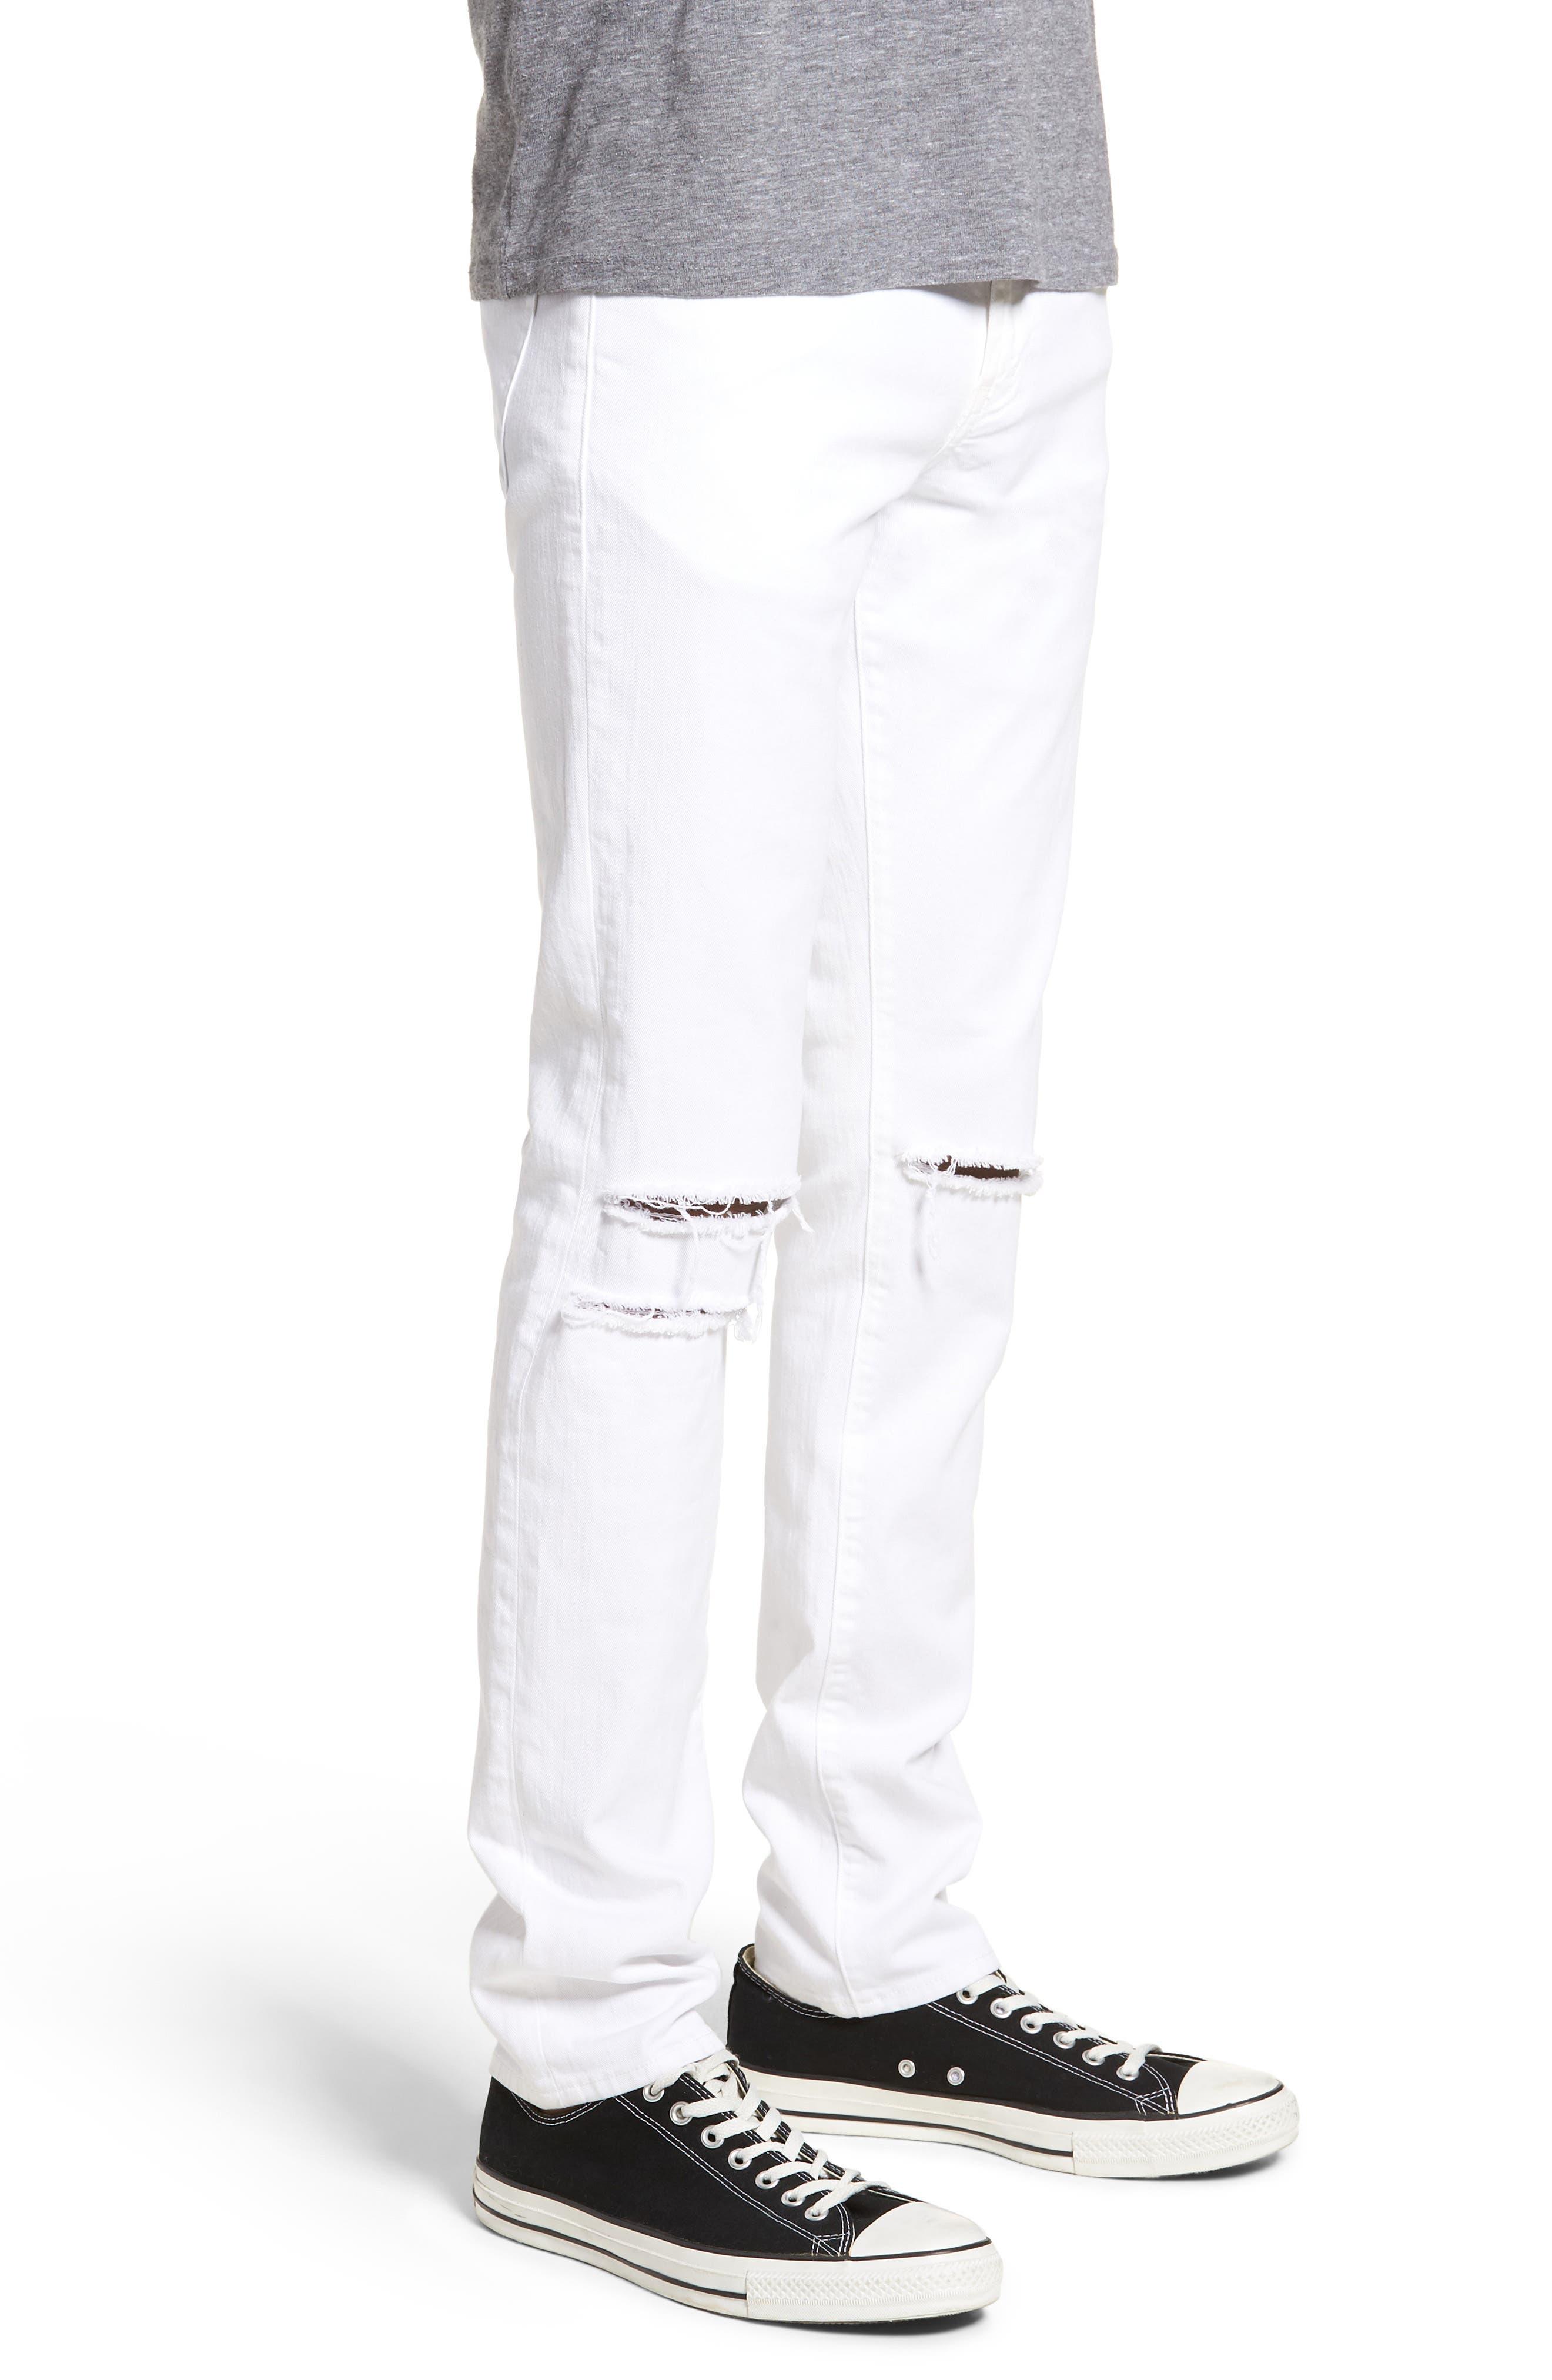 Mick Distressed Skinny Fit Jeans,                             Alternate thumbnail 3, color,                             WHITMAN OAK